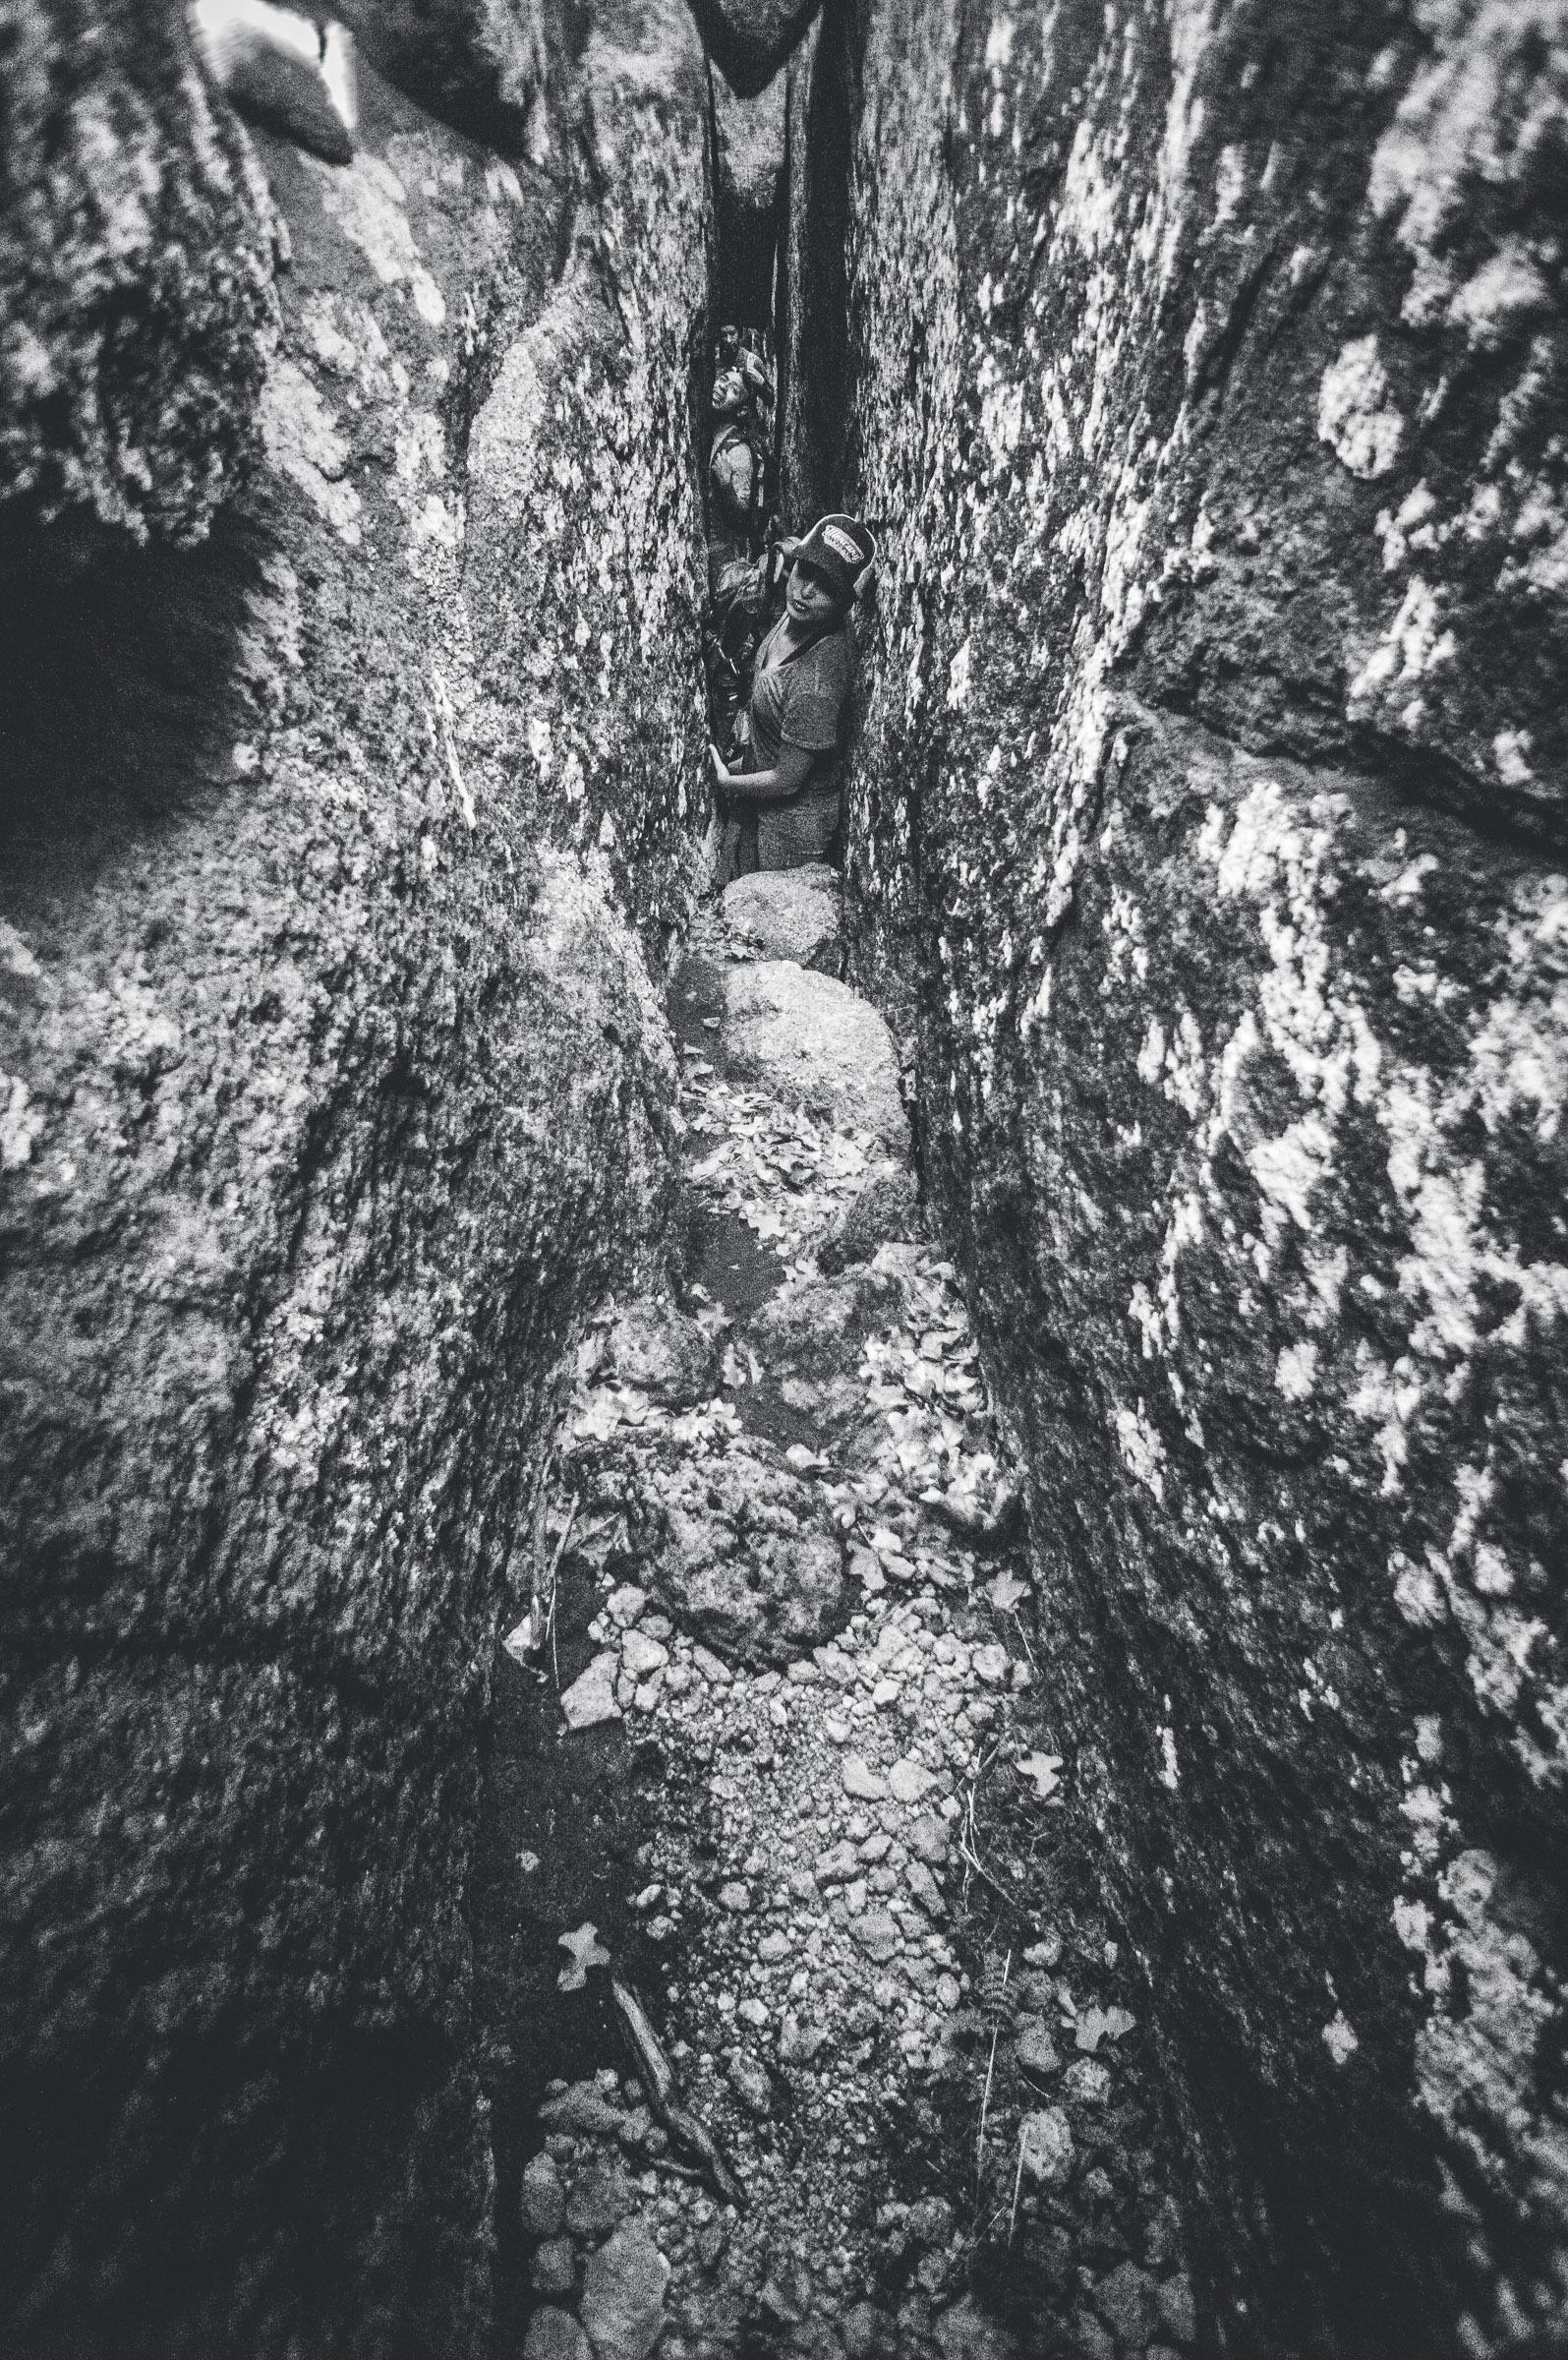 Spanish Cave 11-12-16 B&W (19 of 33).JPG